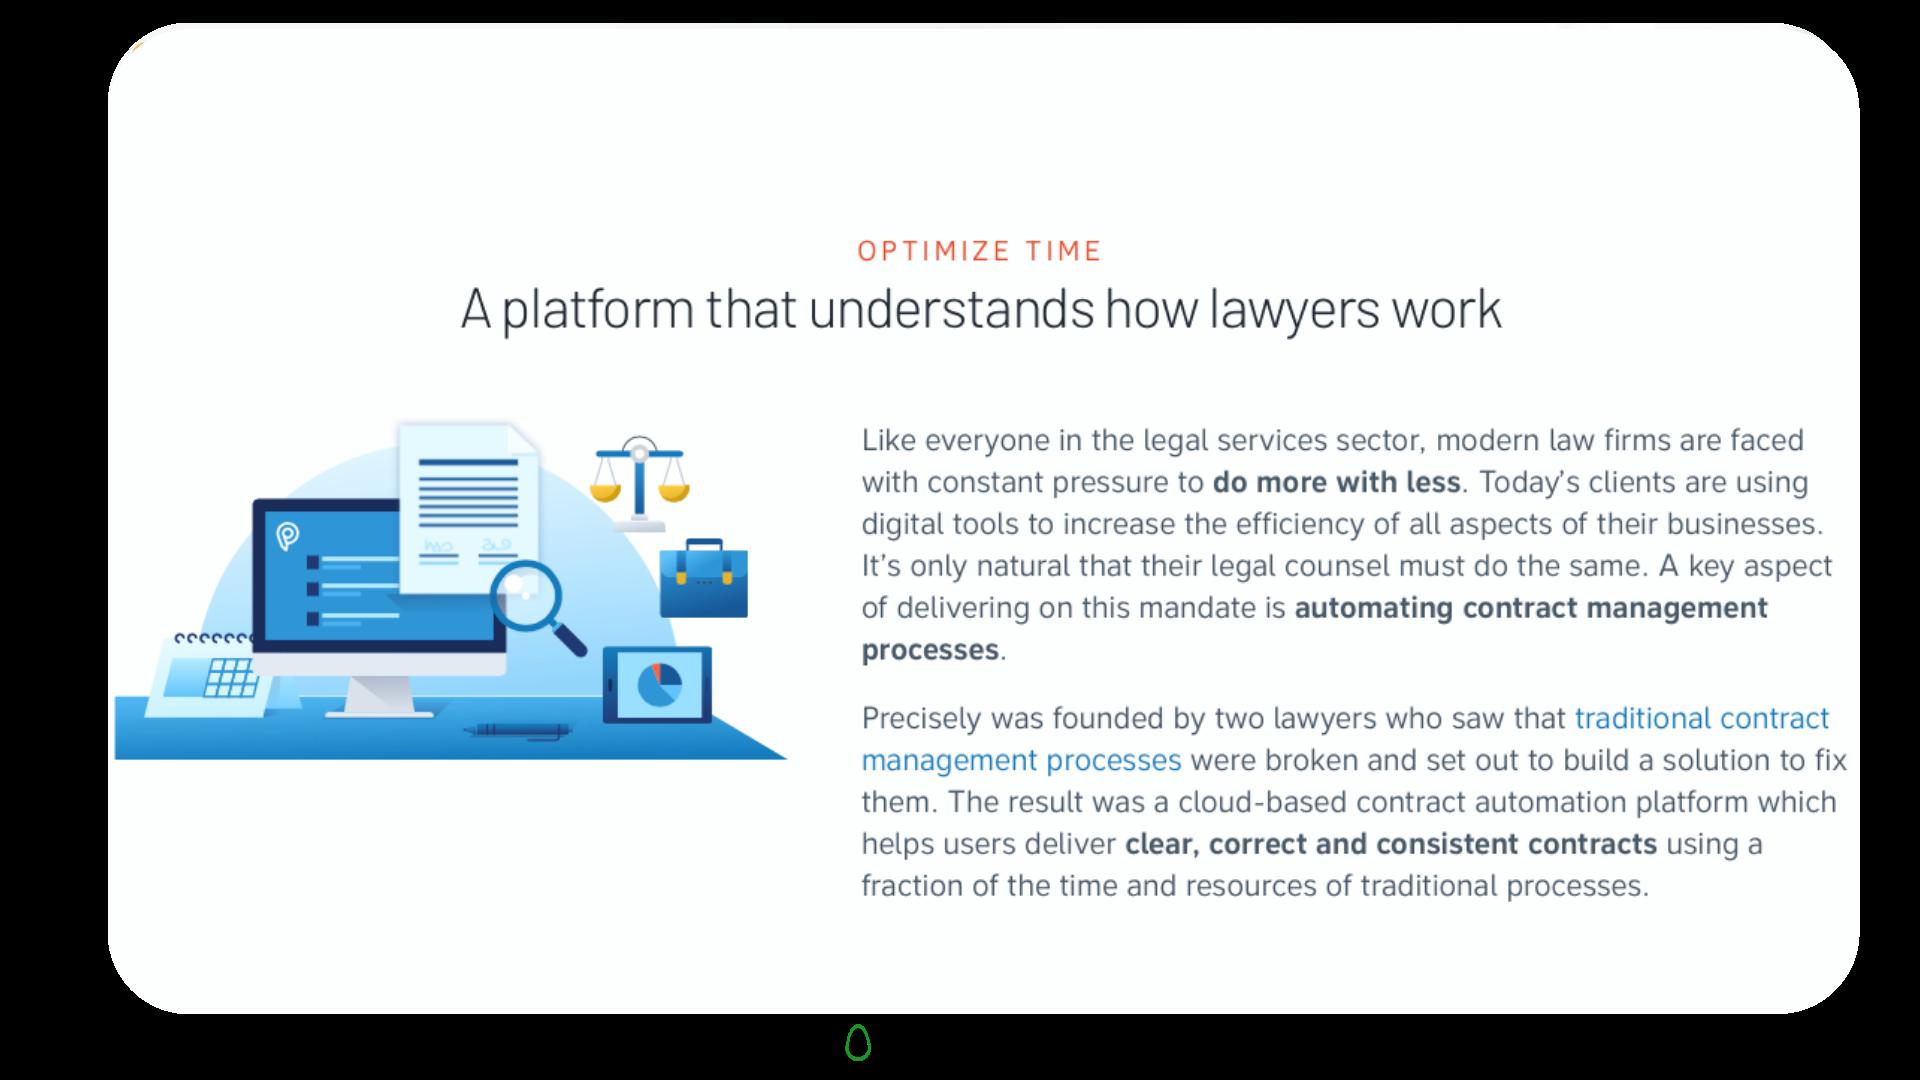 DMS Law Firms Blogpost Illustrations